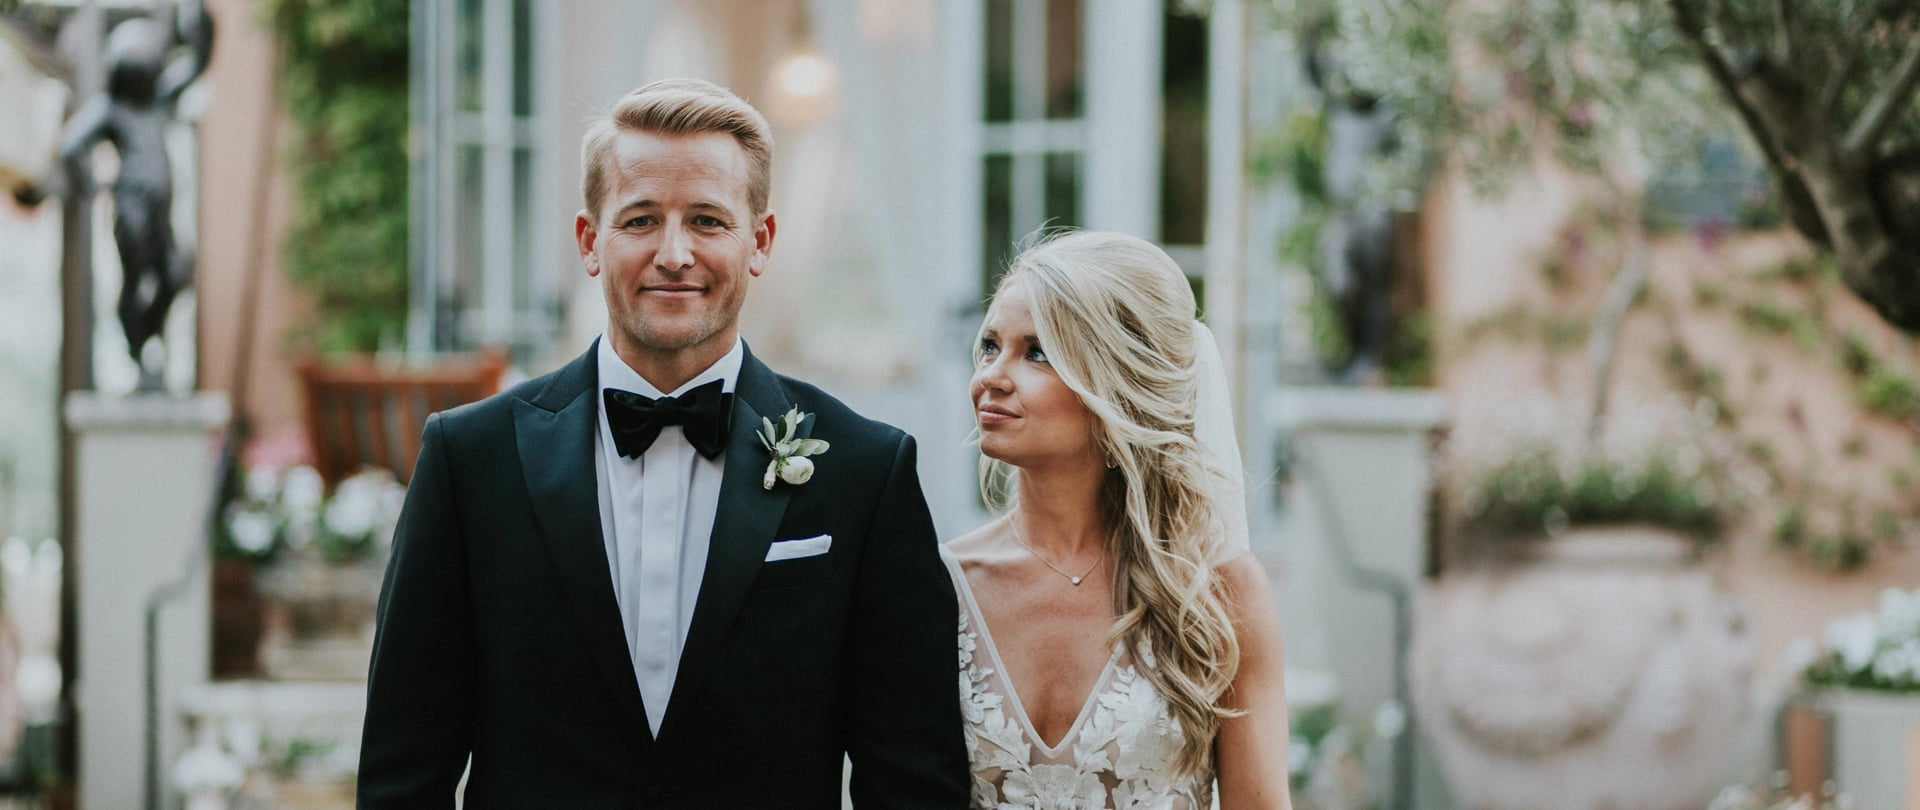 Chelsea & Todd Wedding Video Filmed at Ravello, Italy